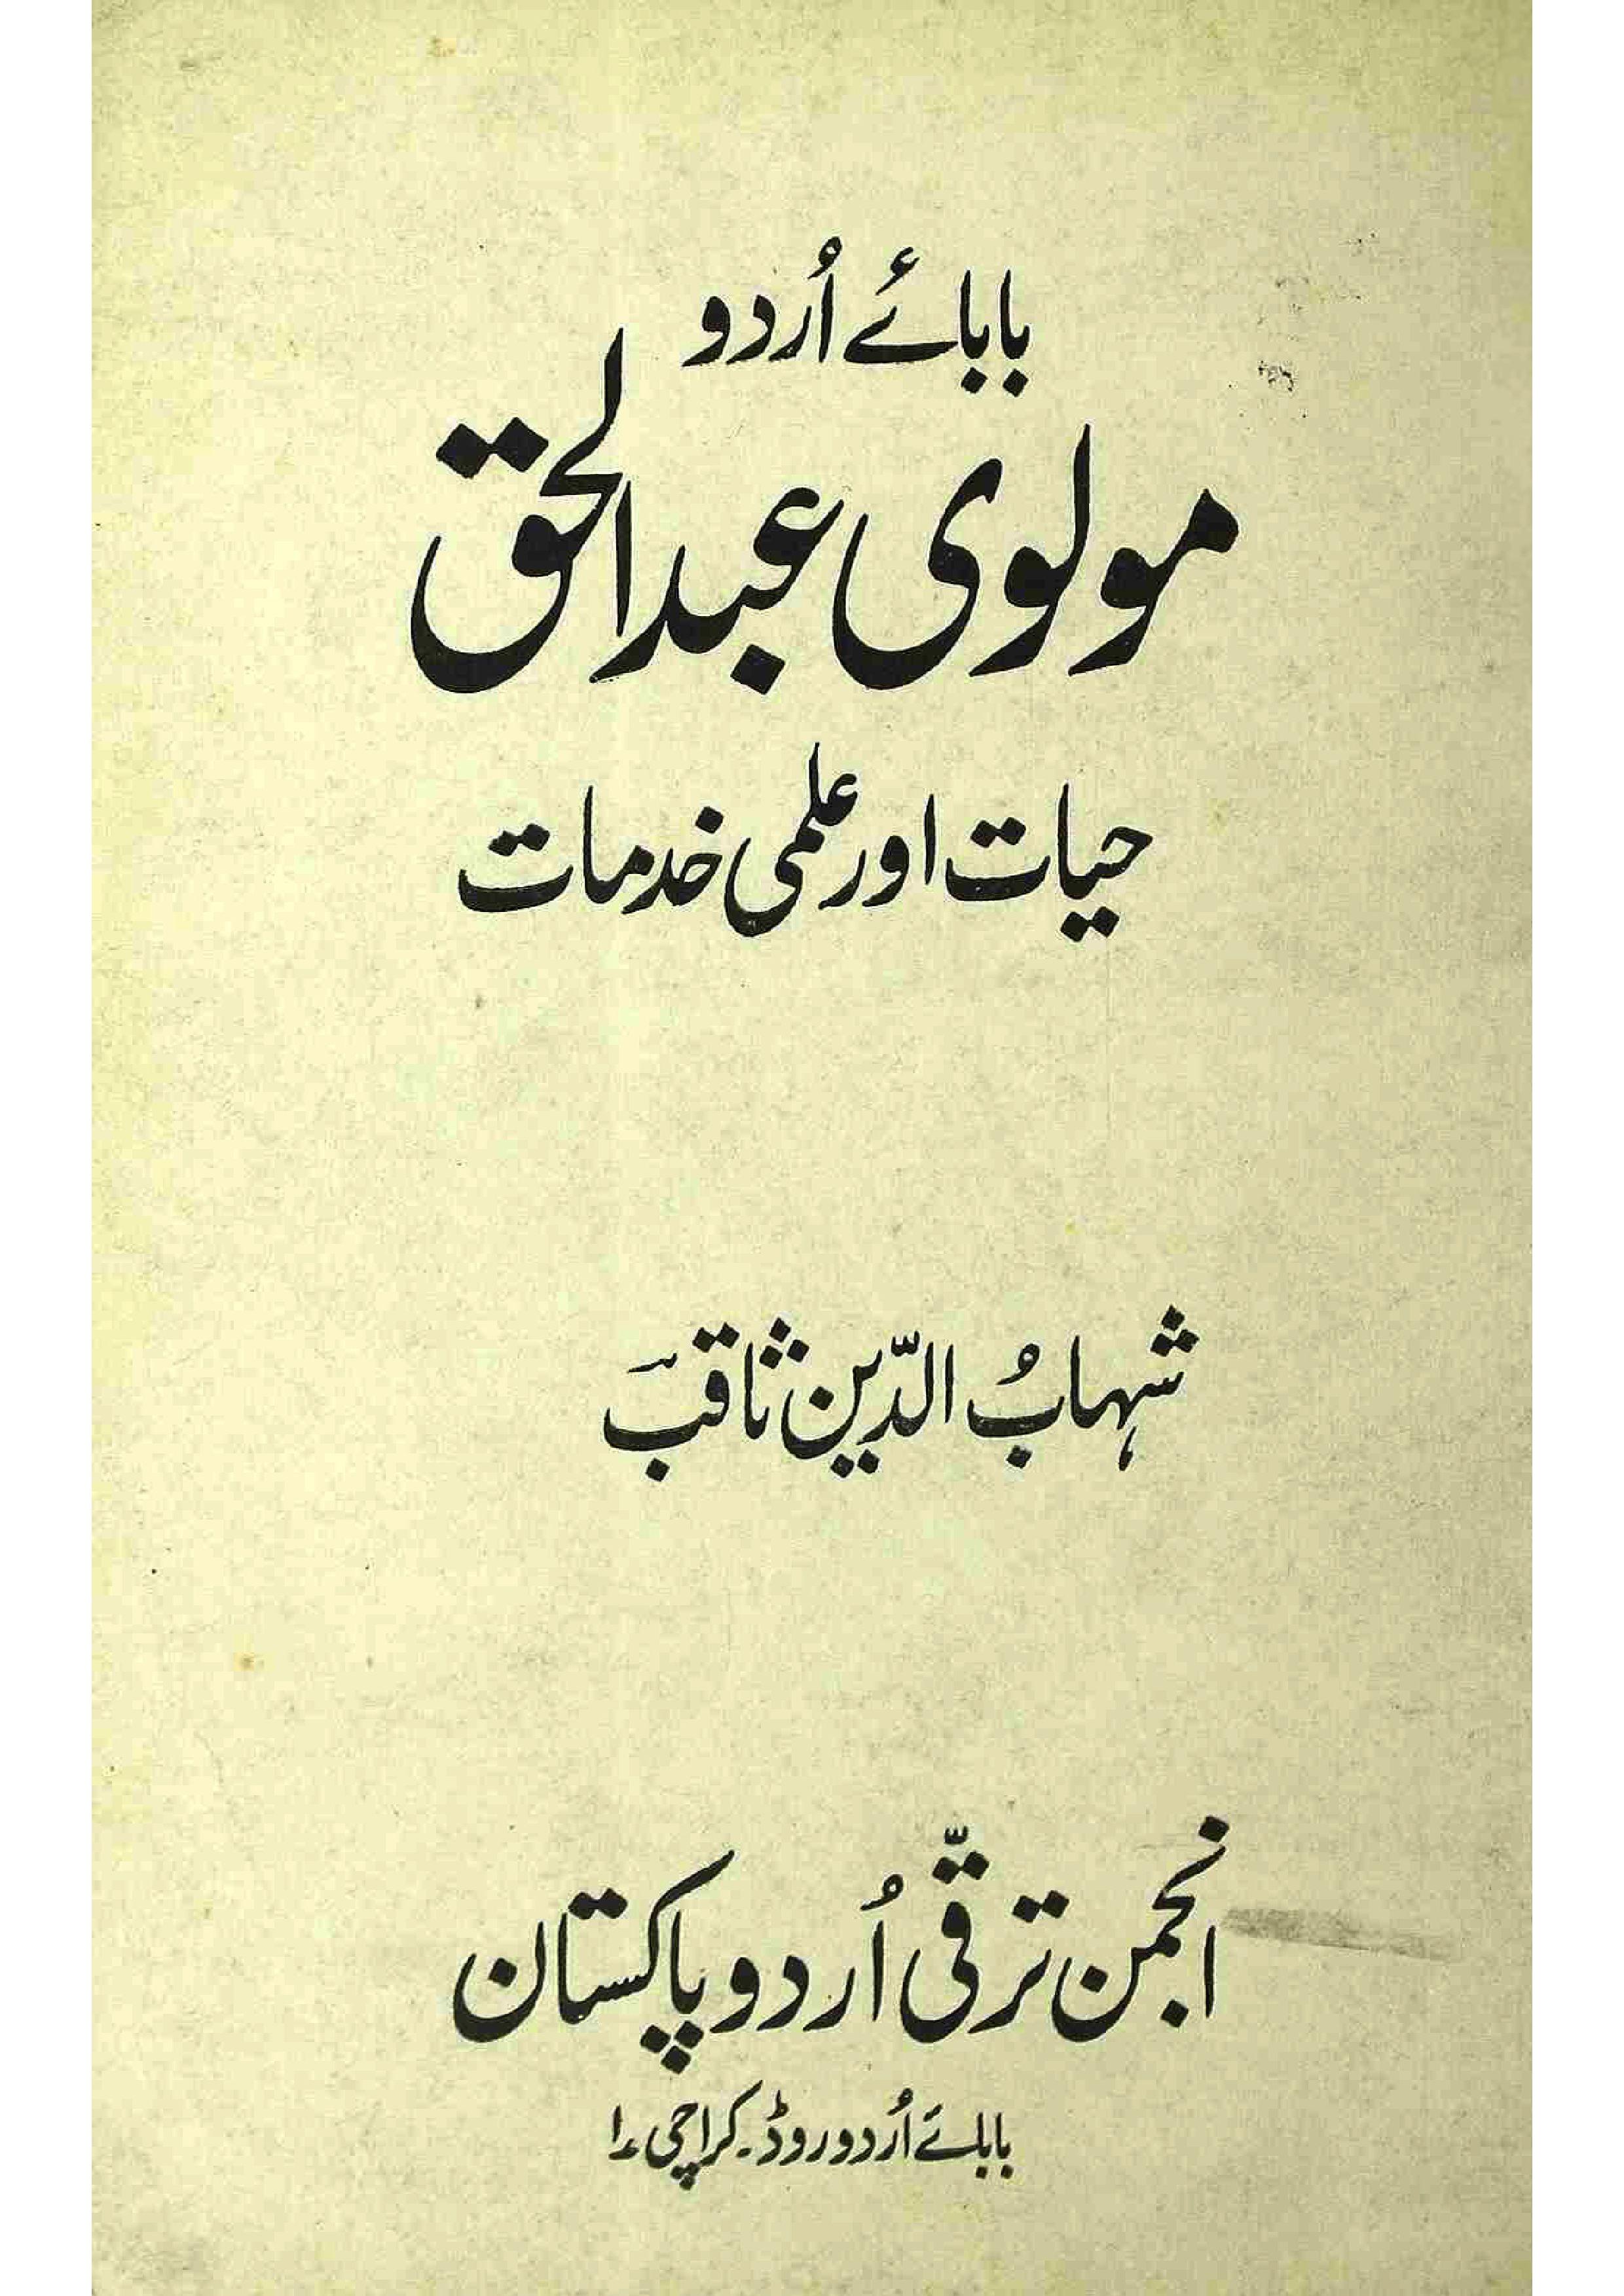 Baba-e-Urdu Maulvi Abdul Haq     Hayat Aur Ilmi Khidmat